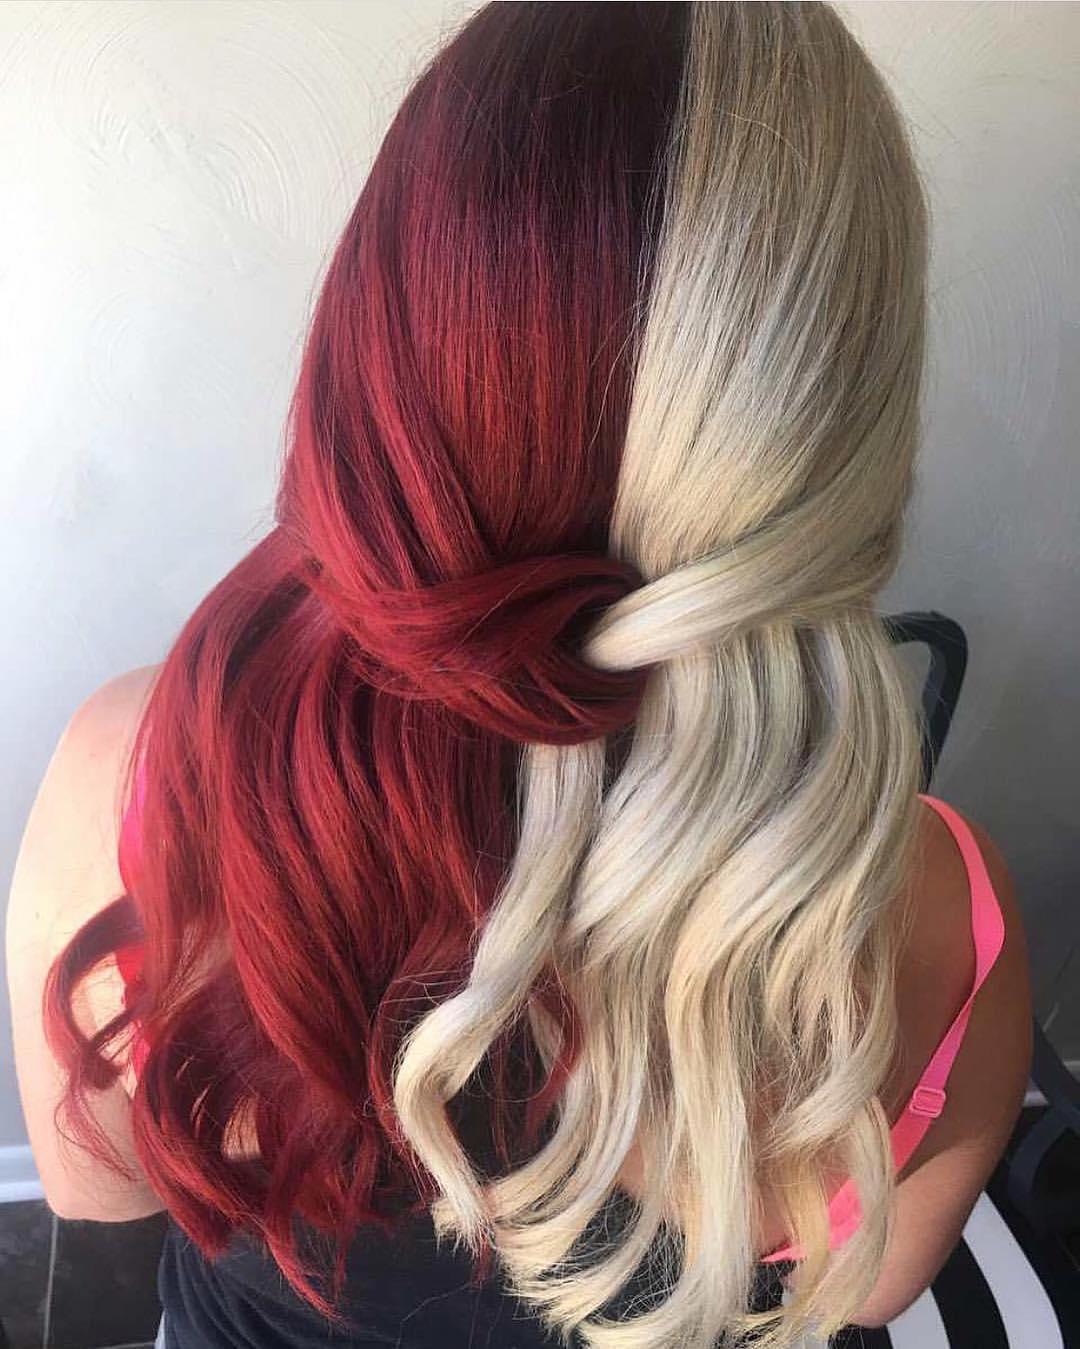 Cabelo-de-duas-cores-Tendências-atuais-de-cores-de-cabelo